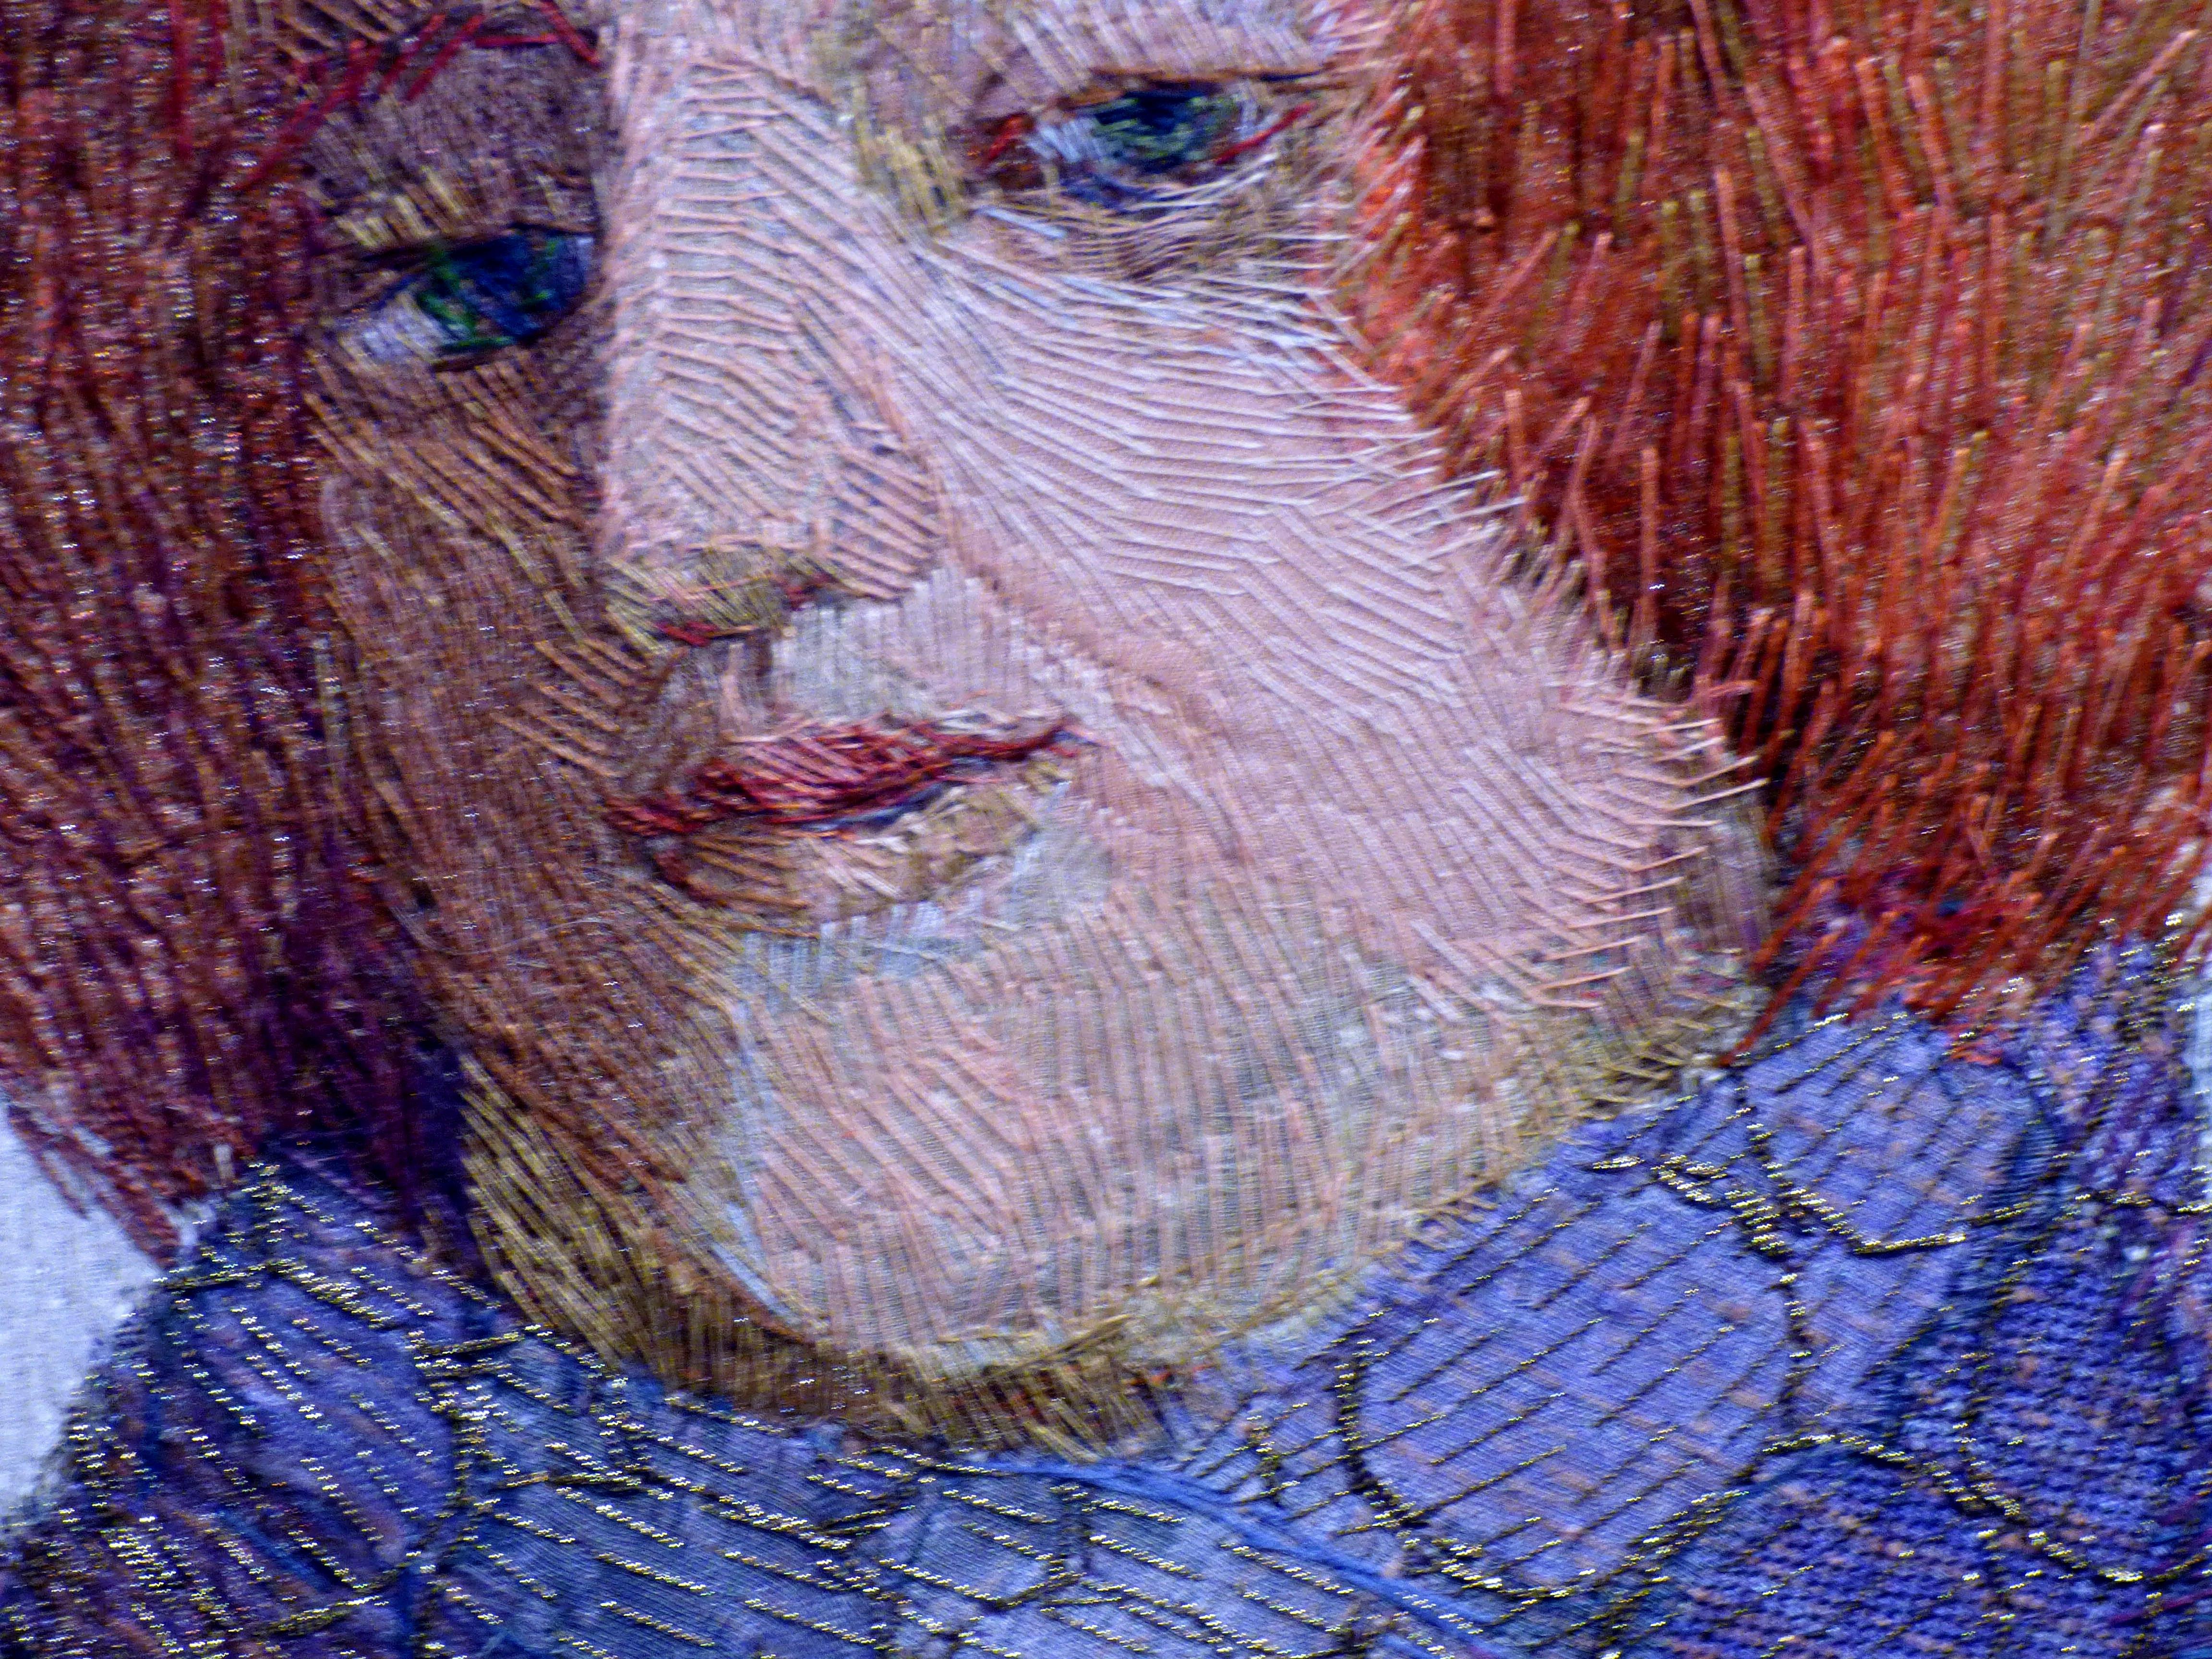 (detail) TEMPTATION (THE COLLECTORS) by Audrey Walker, stitched textile, 2004